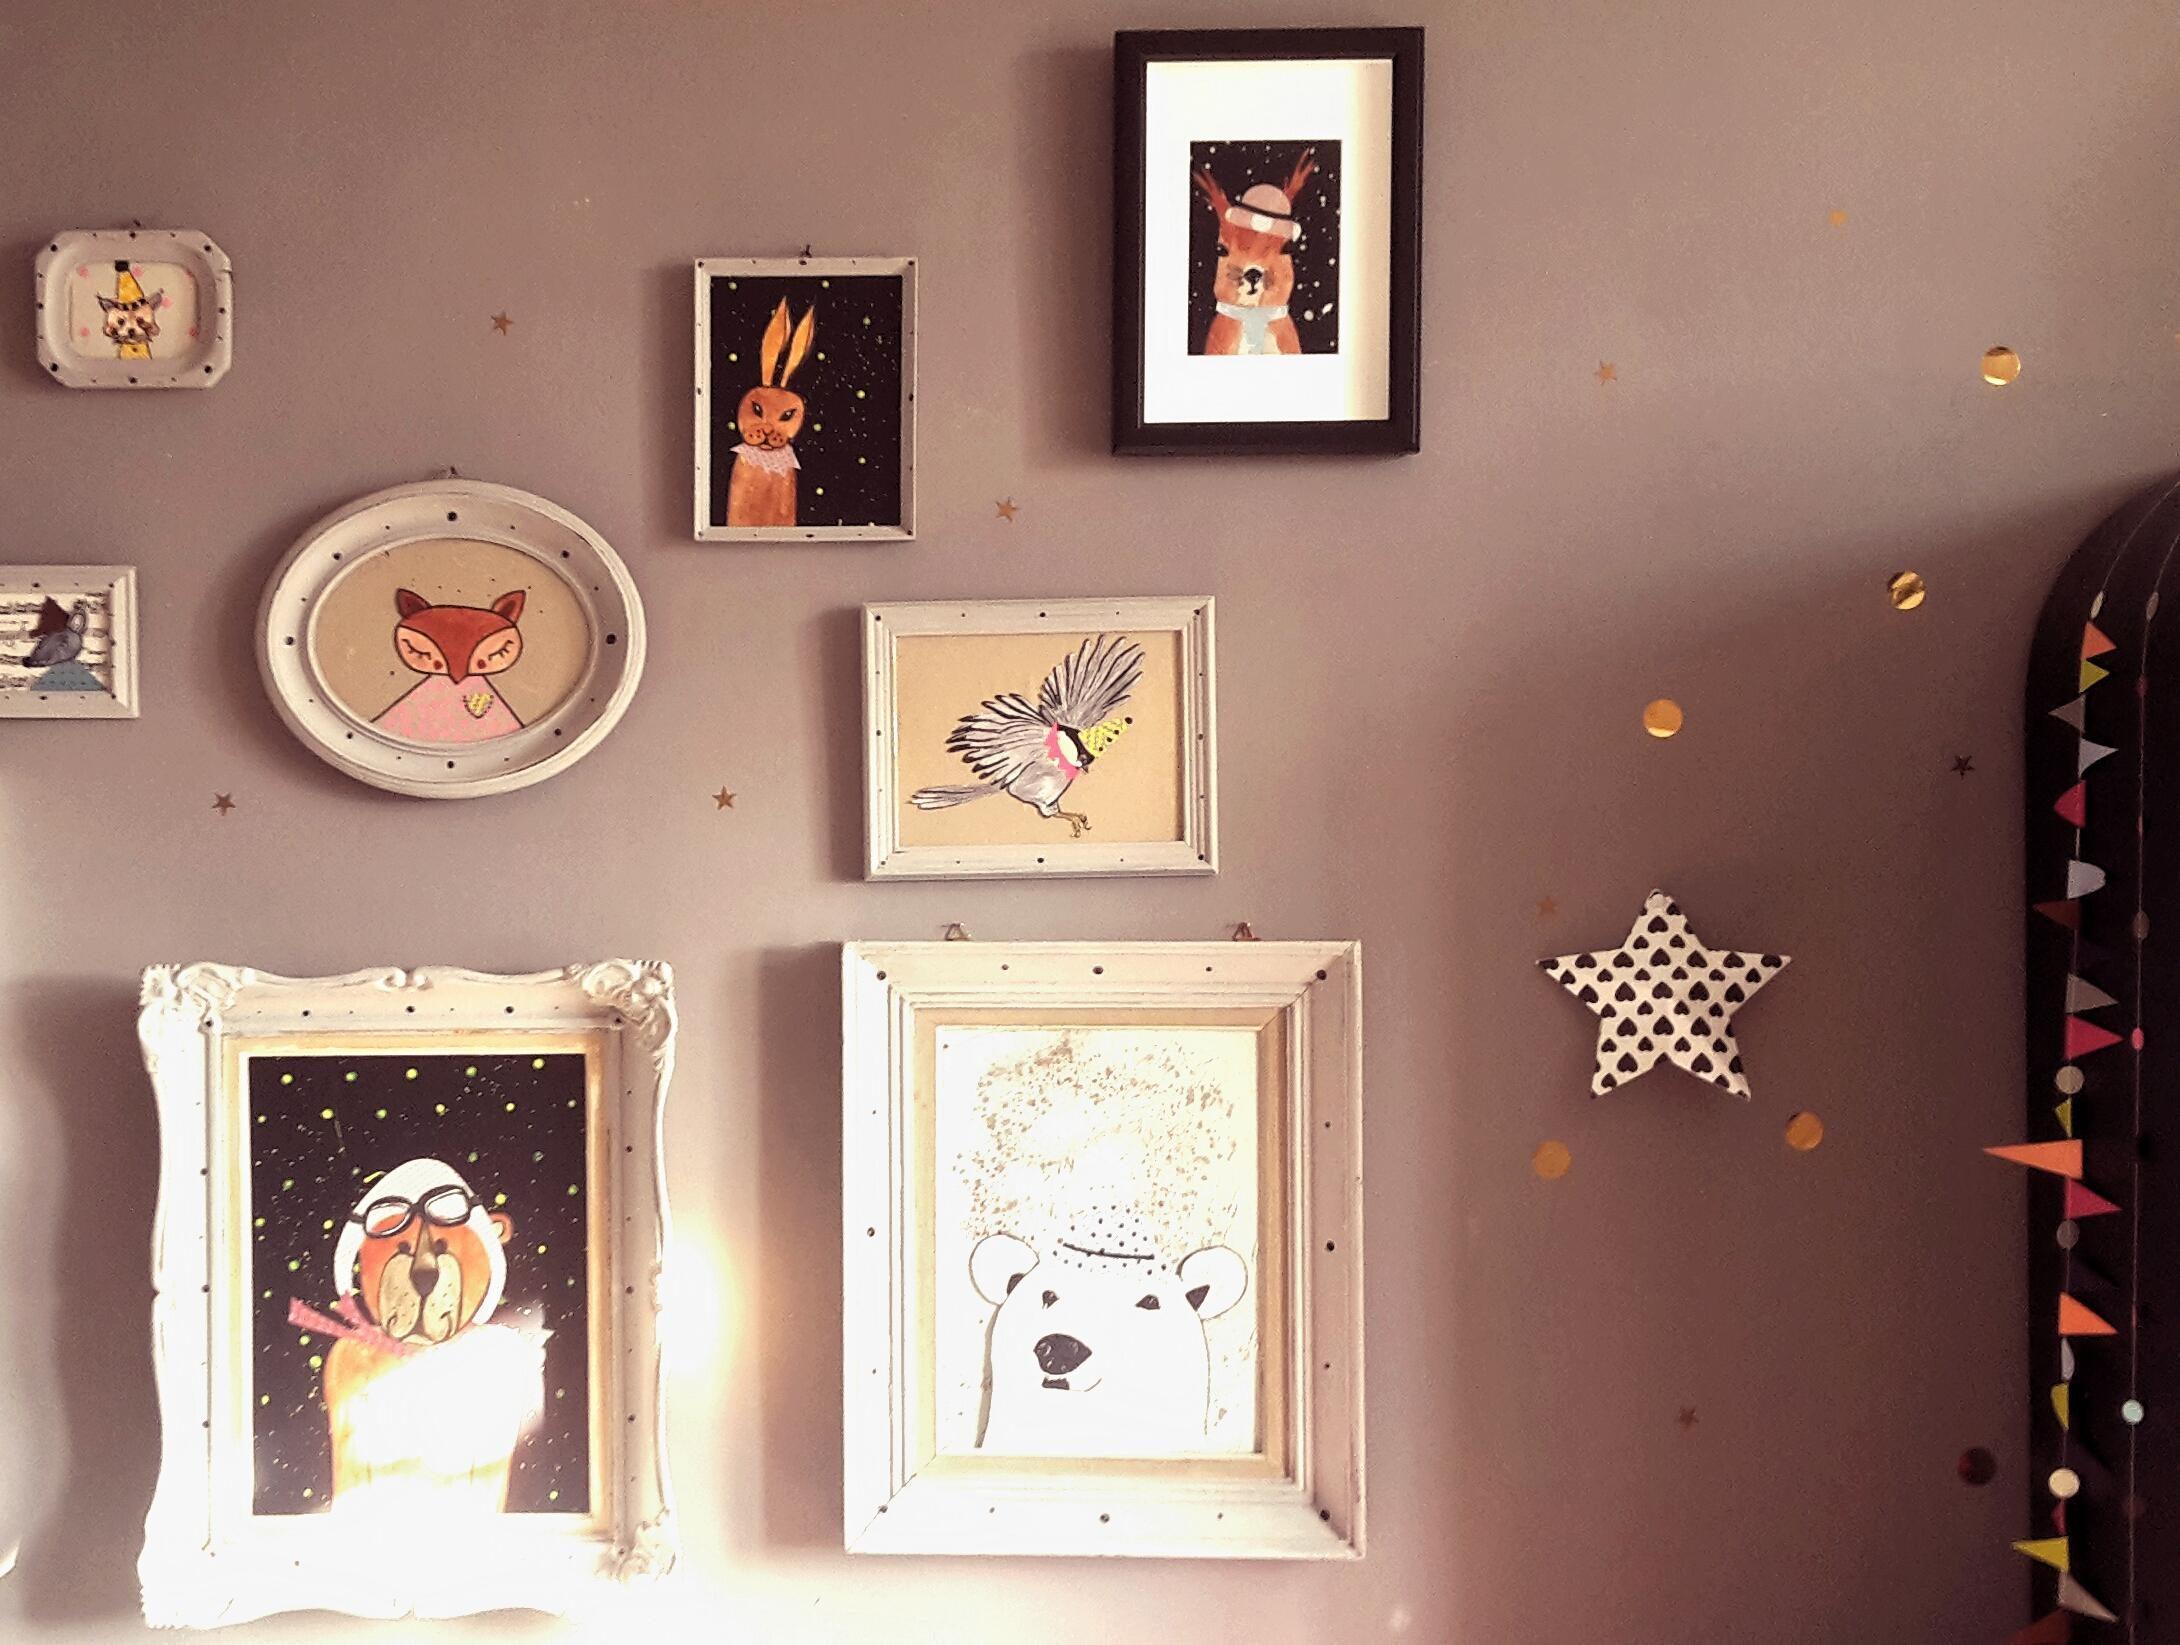 Bilderrahmen Kinderzimmer   Sonnenstrahlen Im Kinderzimmer Bilderrahmen Tier